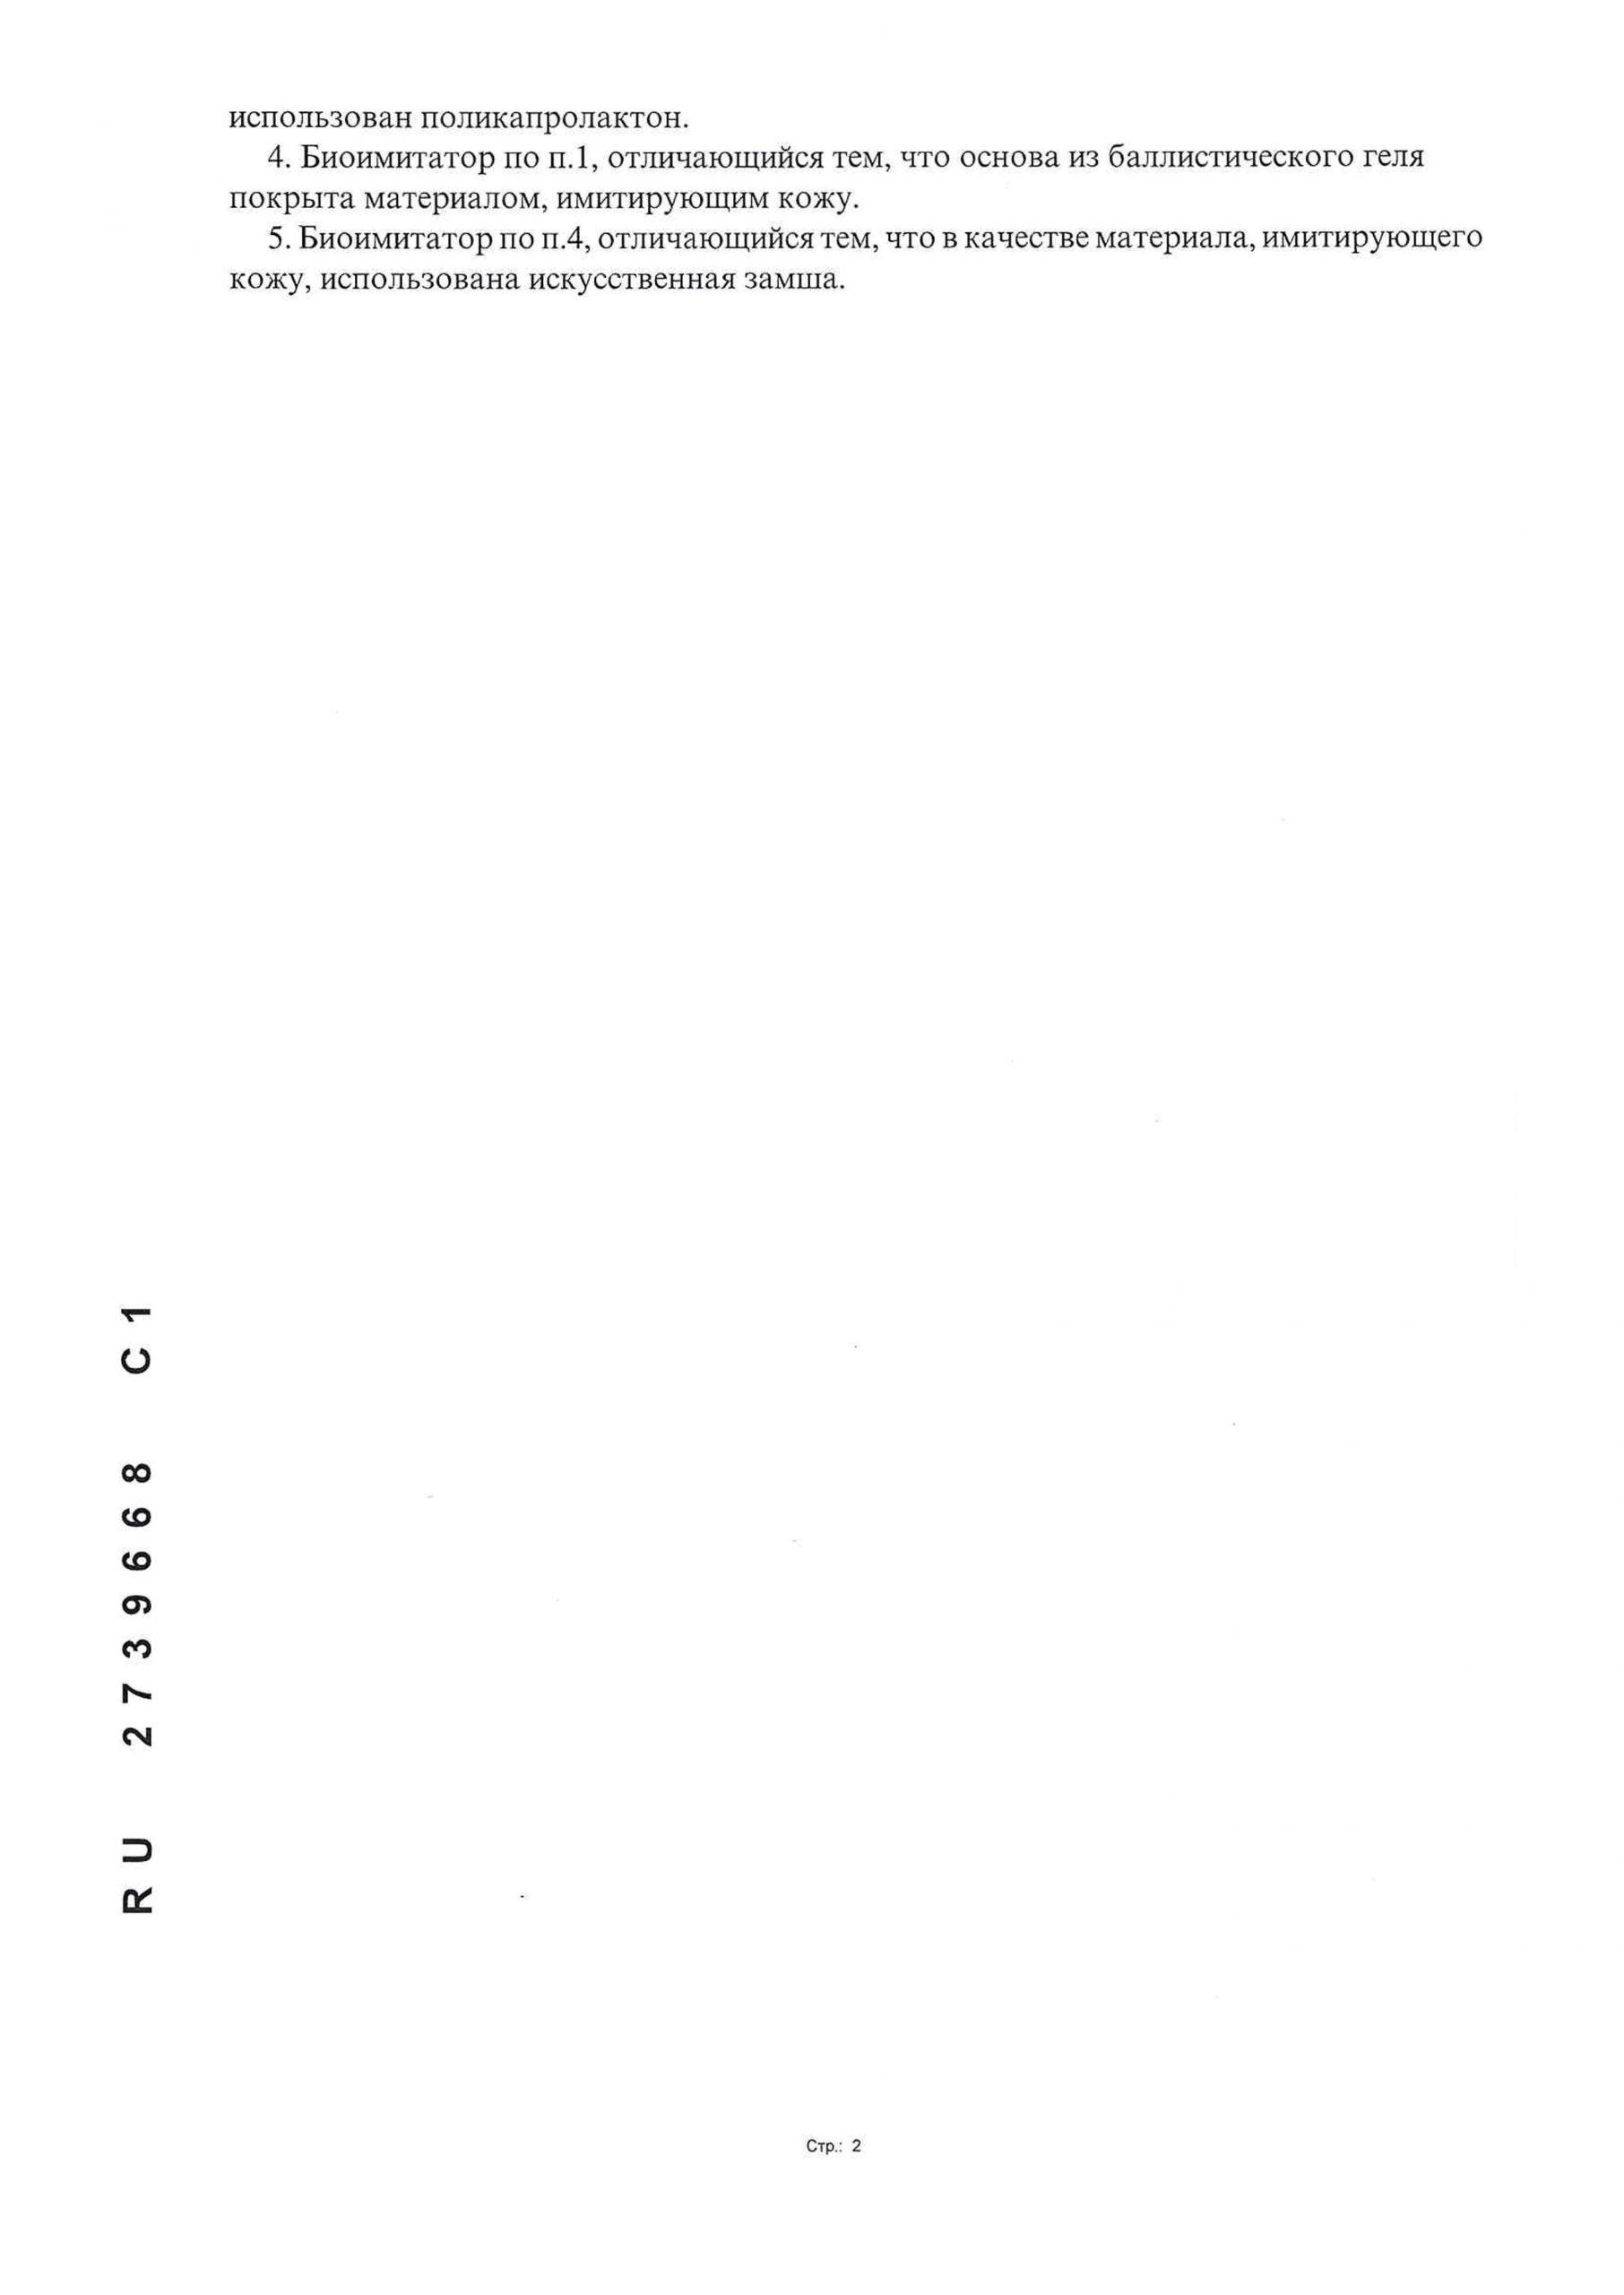 Биоимитатор_0004